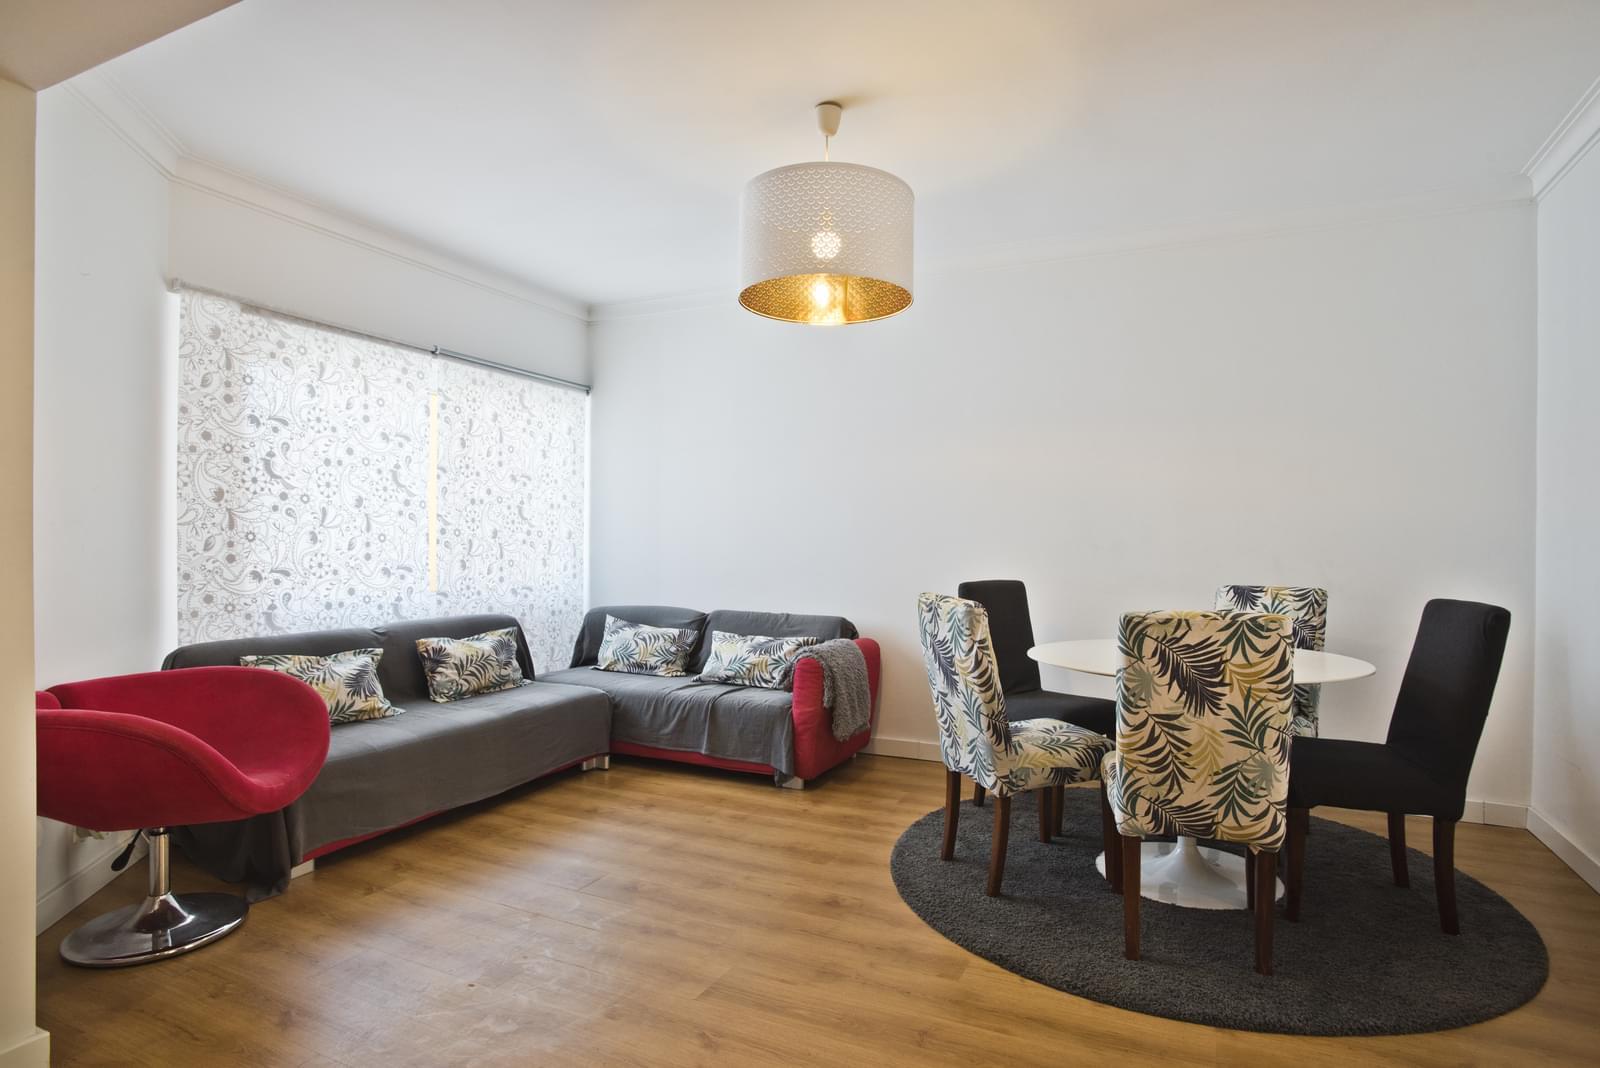 pf17010-apartamento-t4-cascais-1f2c6e67-f973-4574-b120-36911d258f55